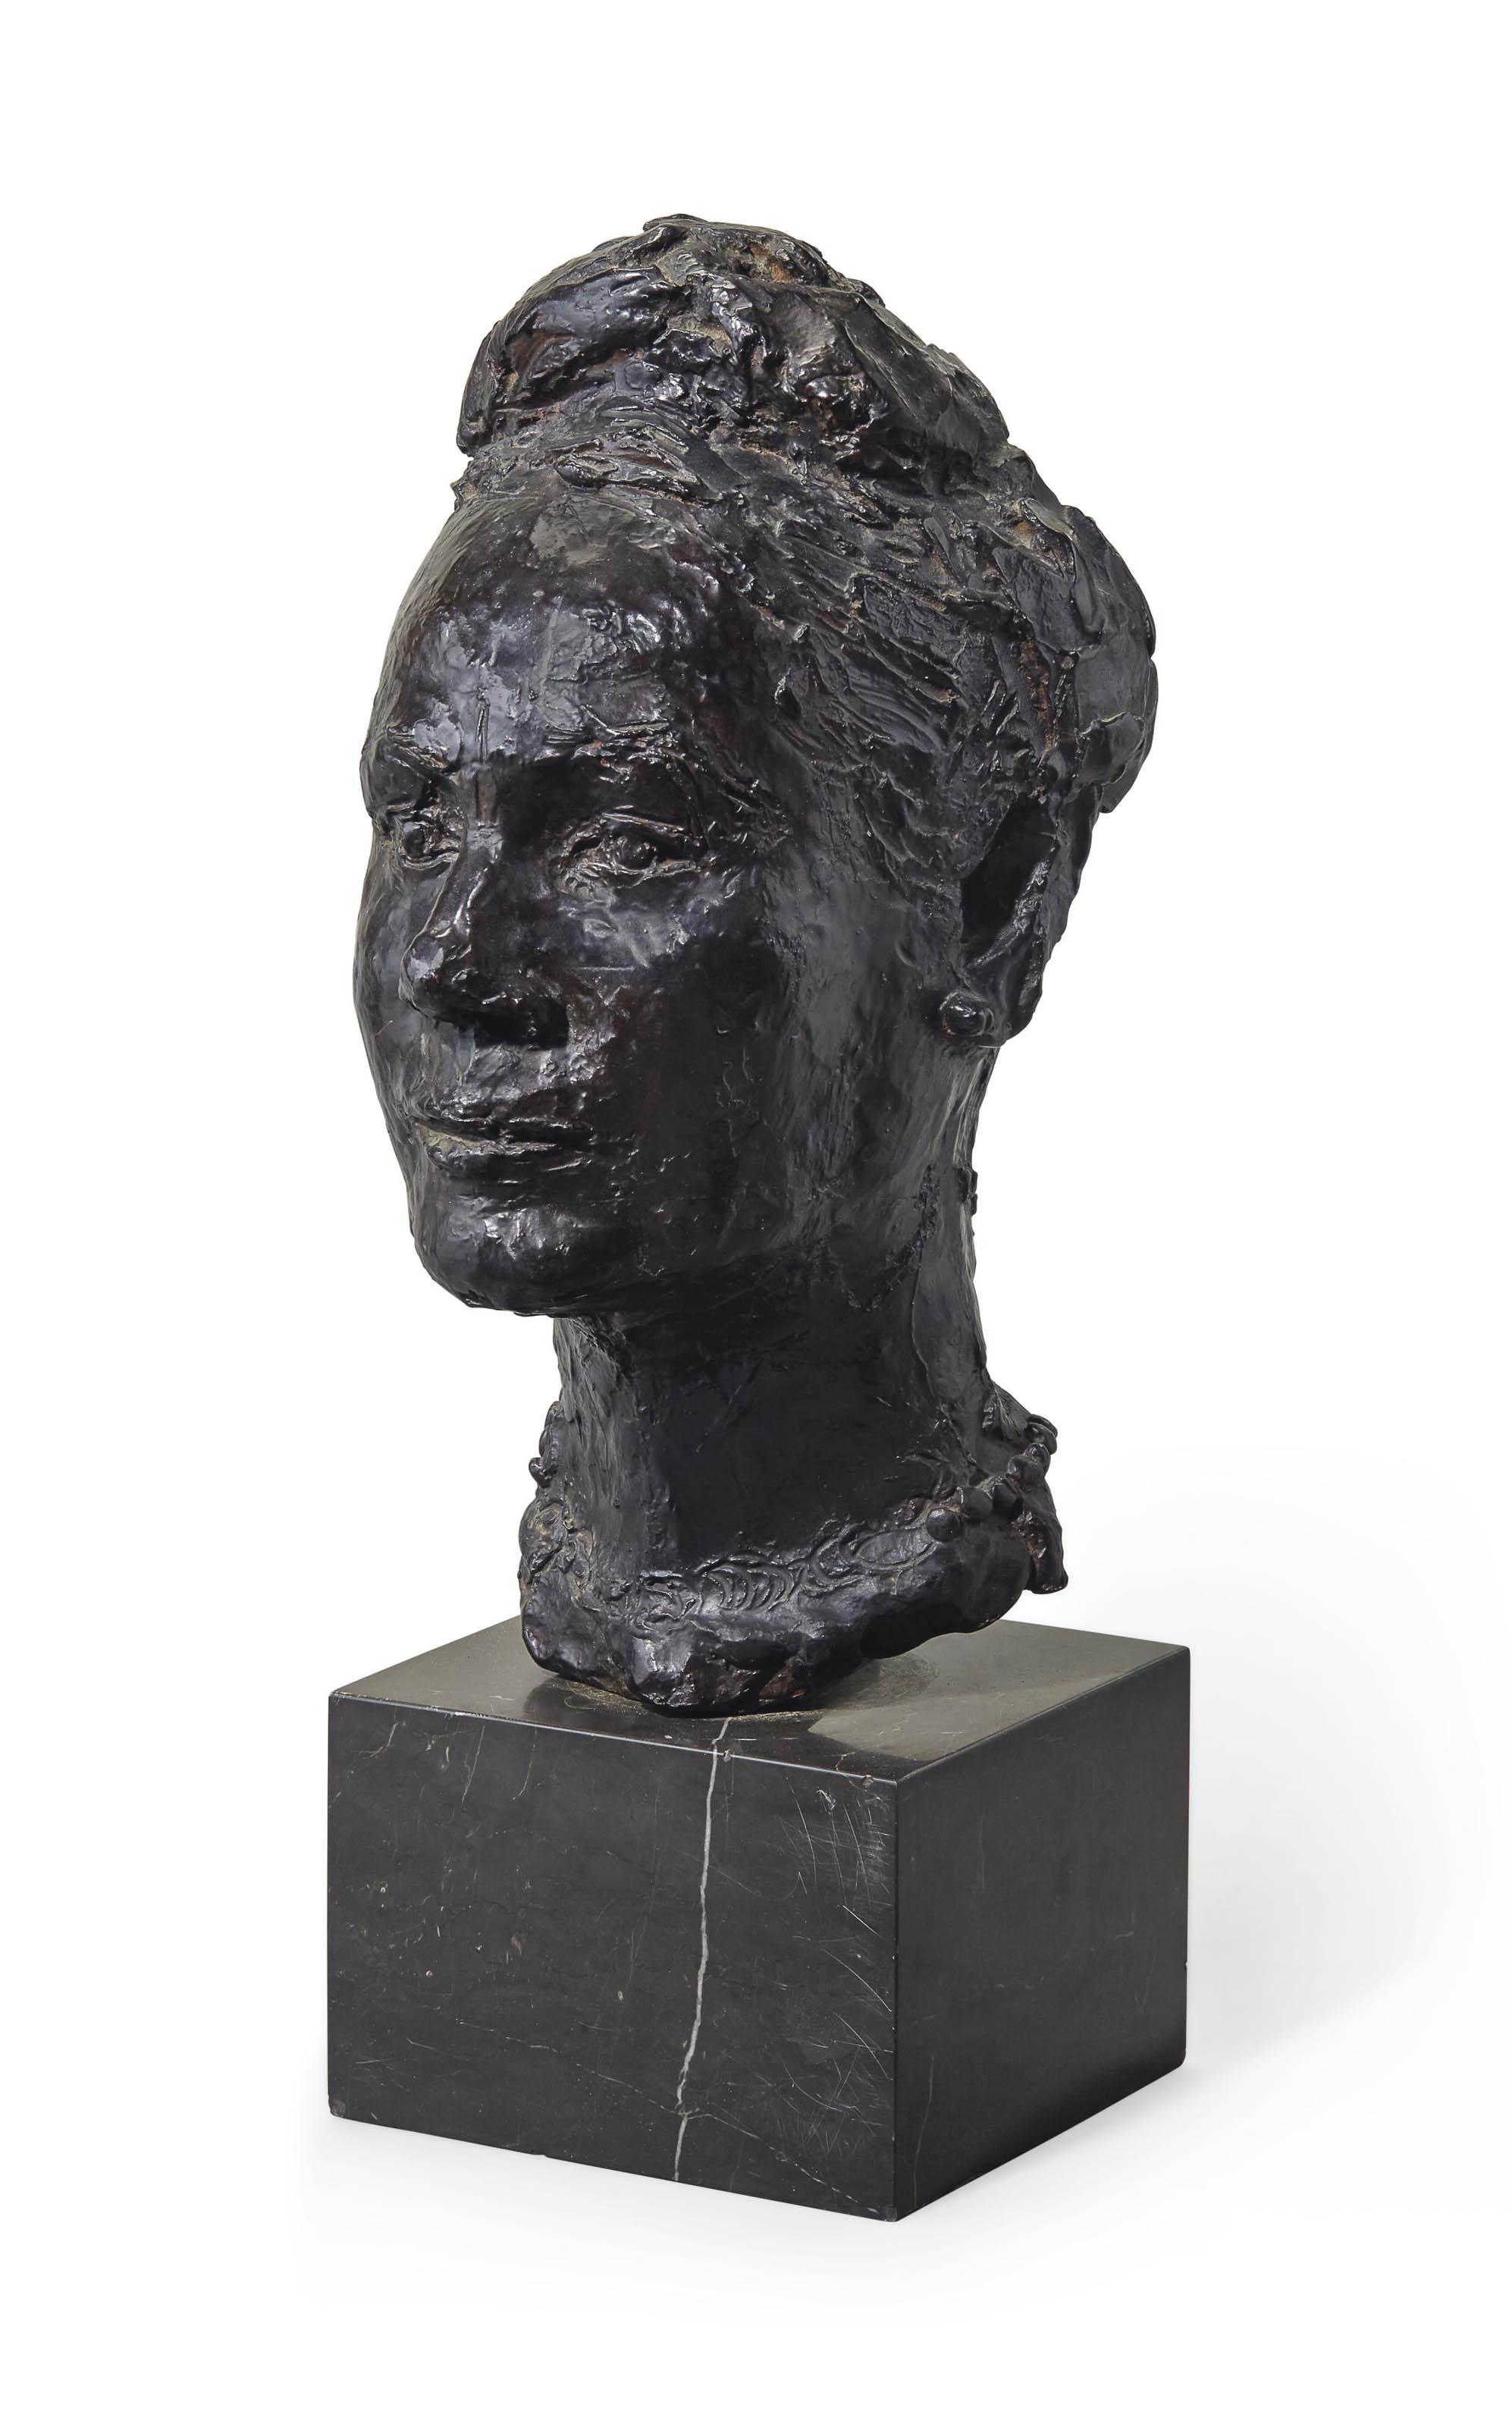 GERMAINE RICHIER (1902-1958)